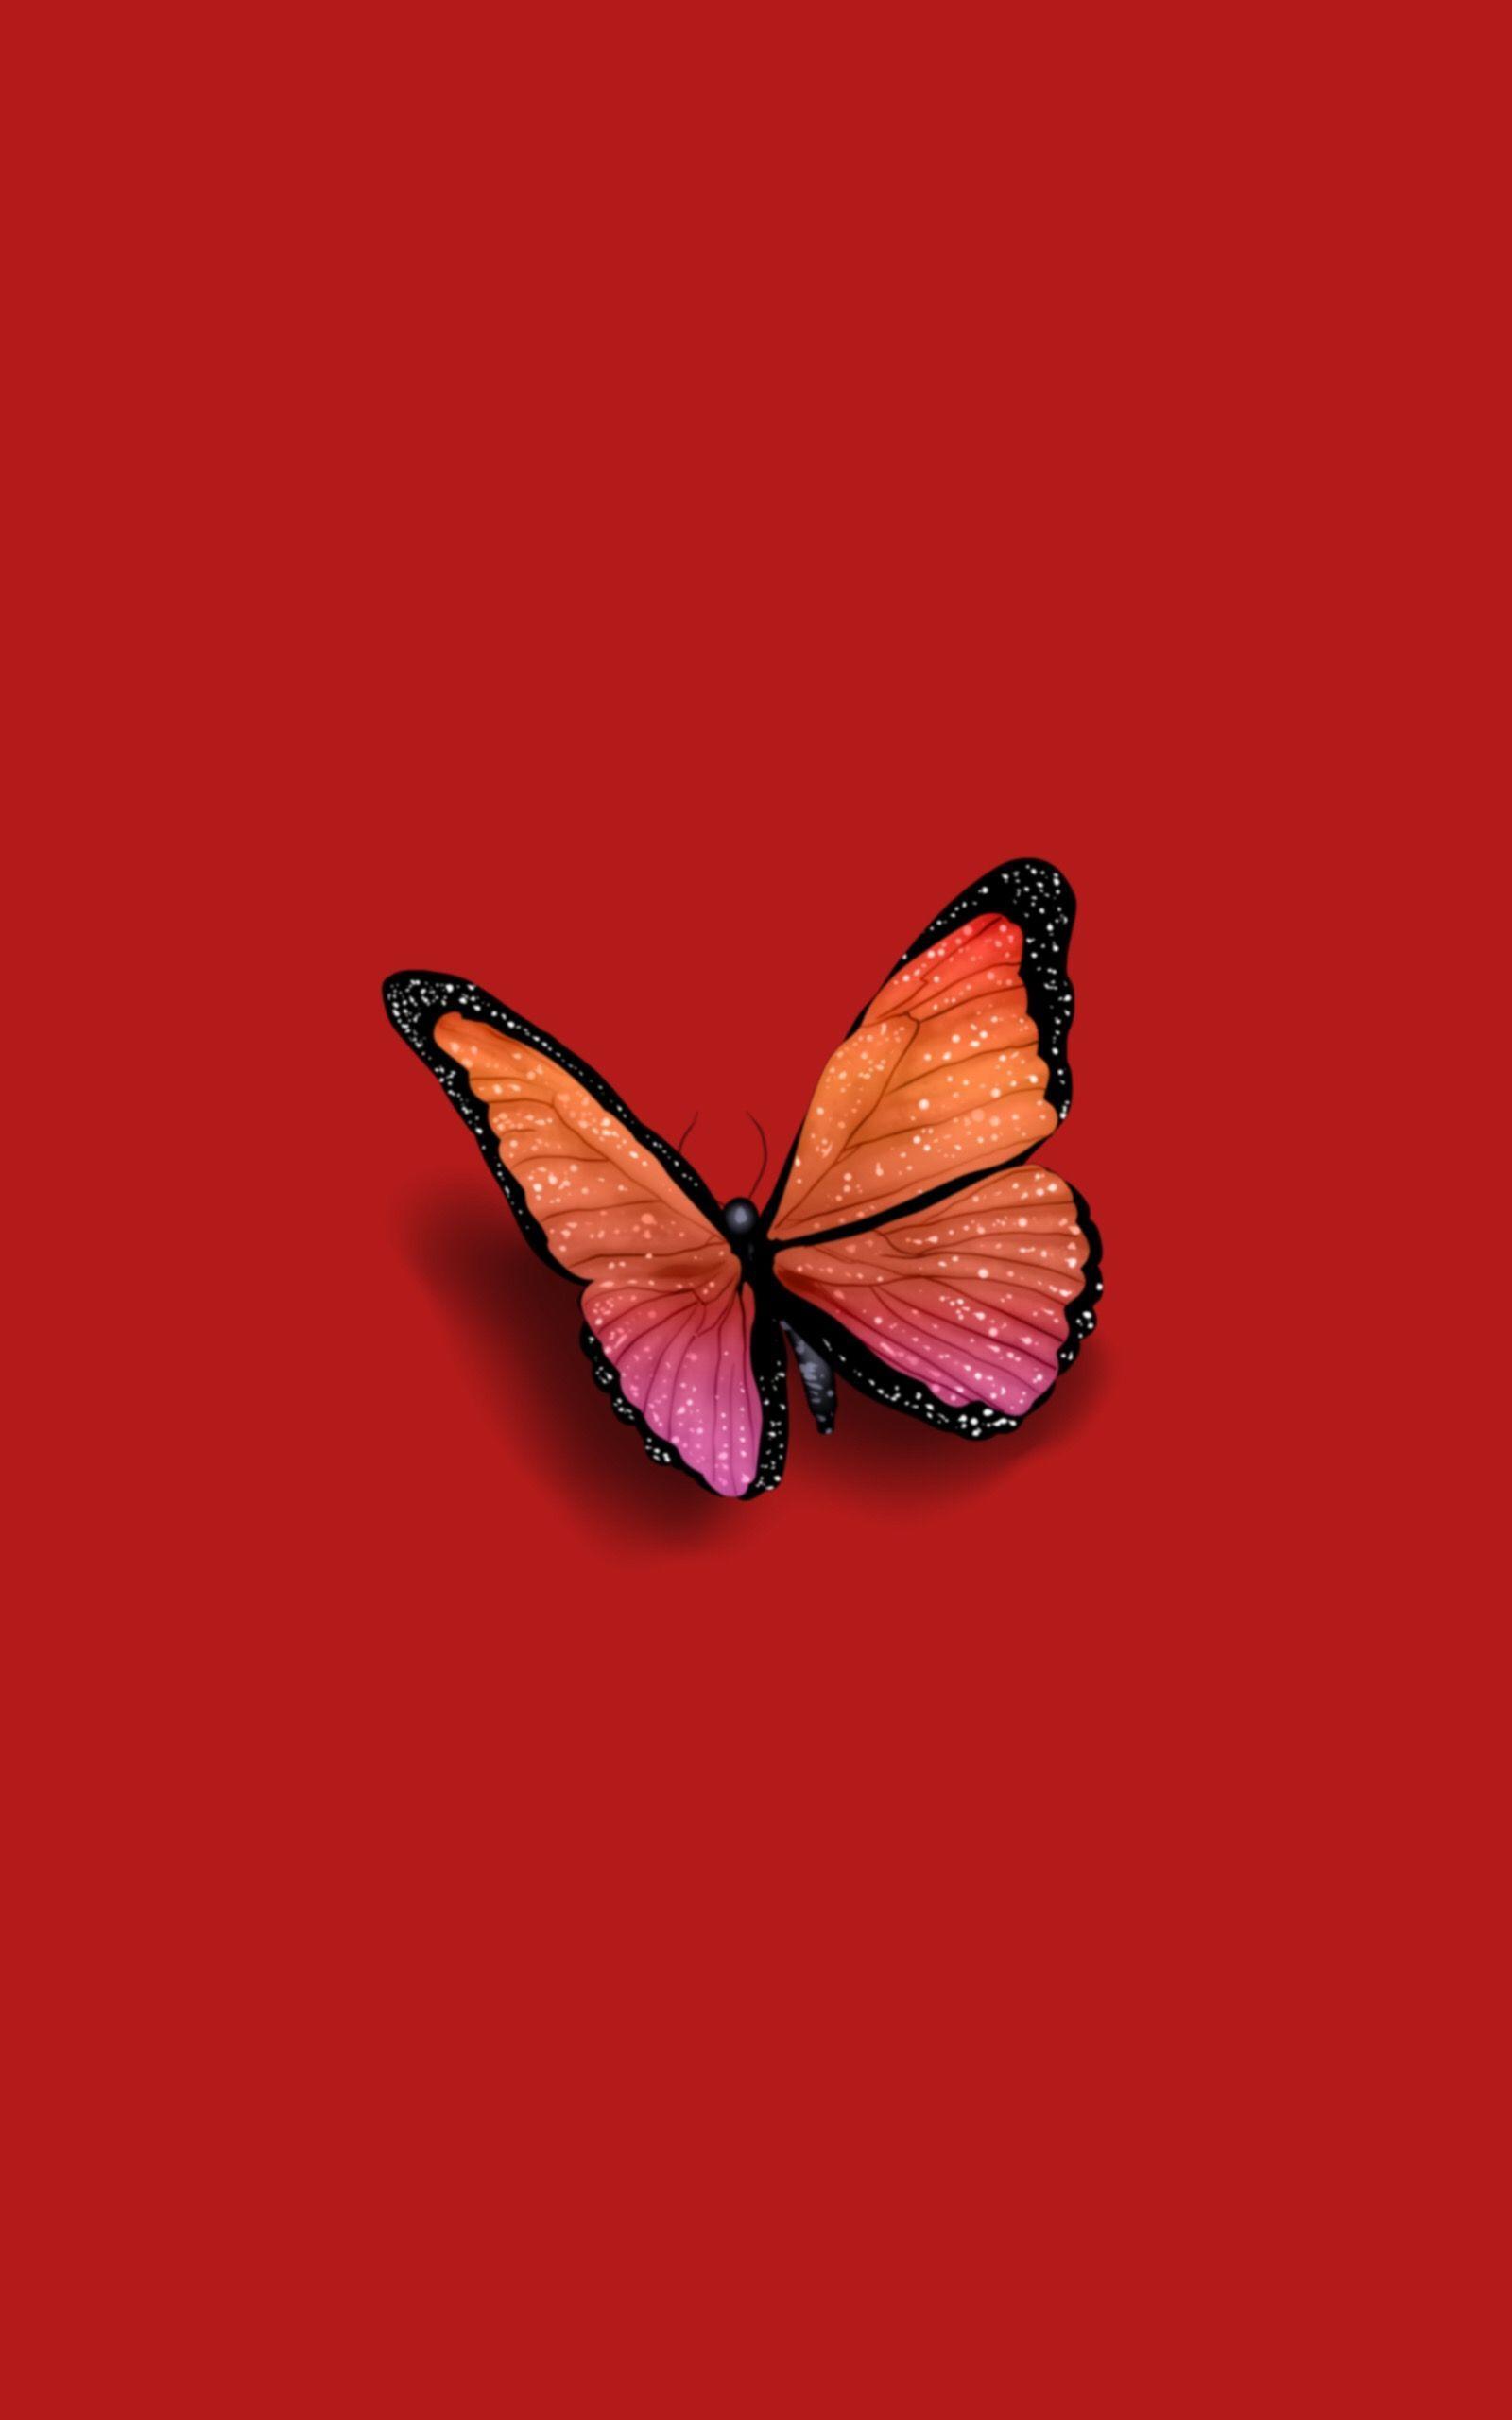 Butterfly Iphone Wallpaper Aesthetic Di 2020 Seni Animasi Kupu